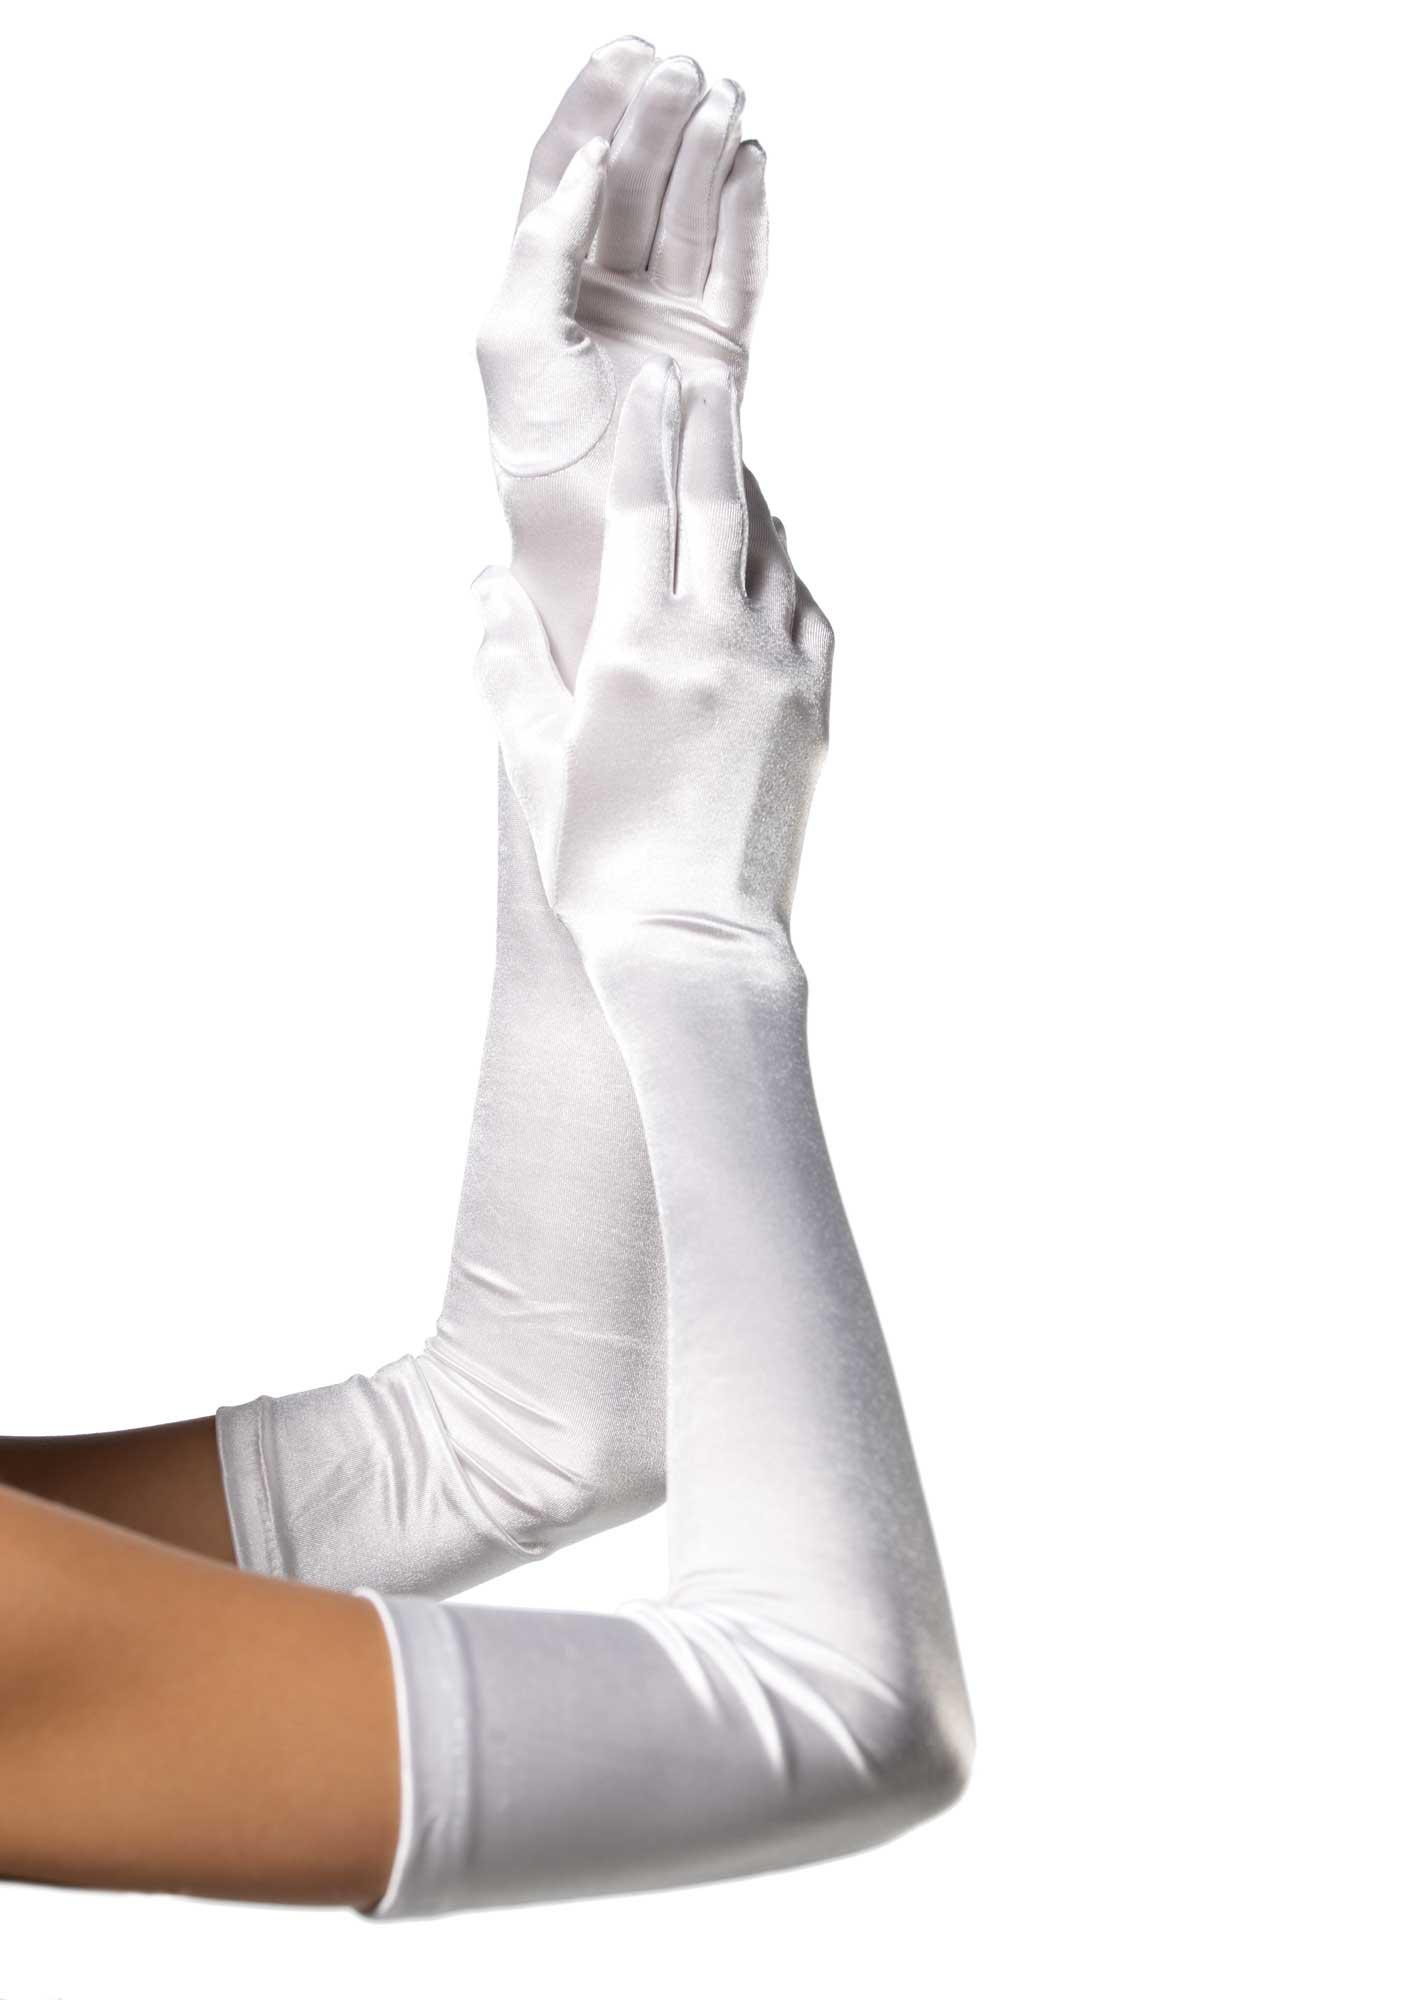 Classic Satin Opera Glove Assorted Colors 0073 Edmonton